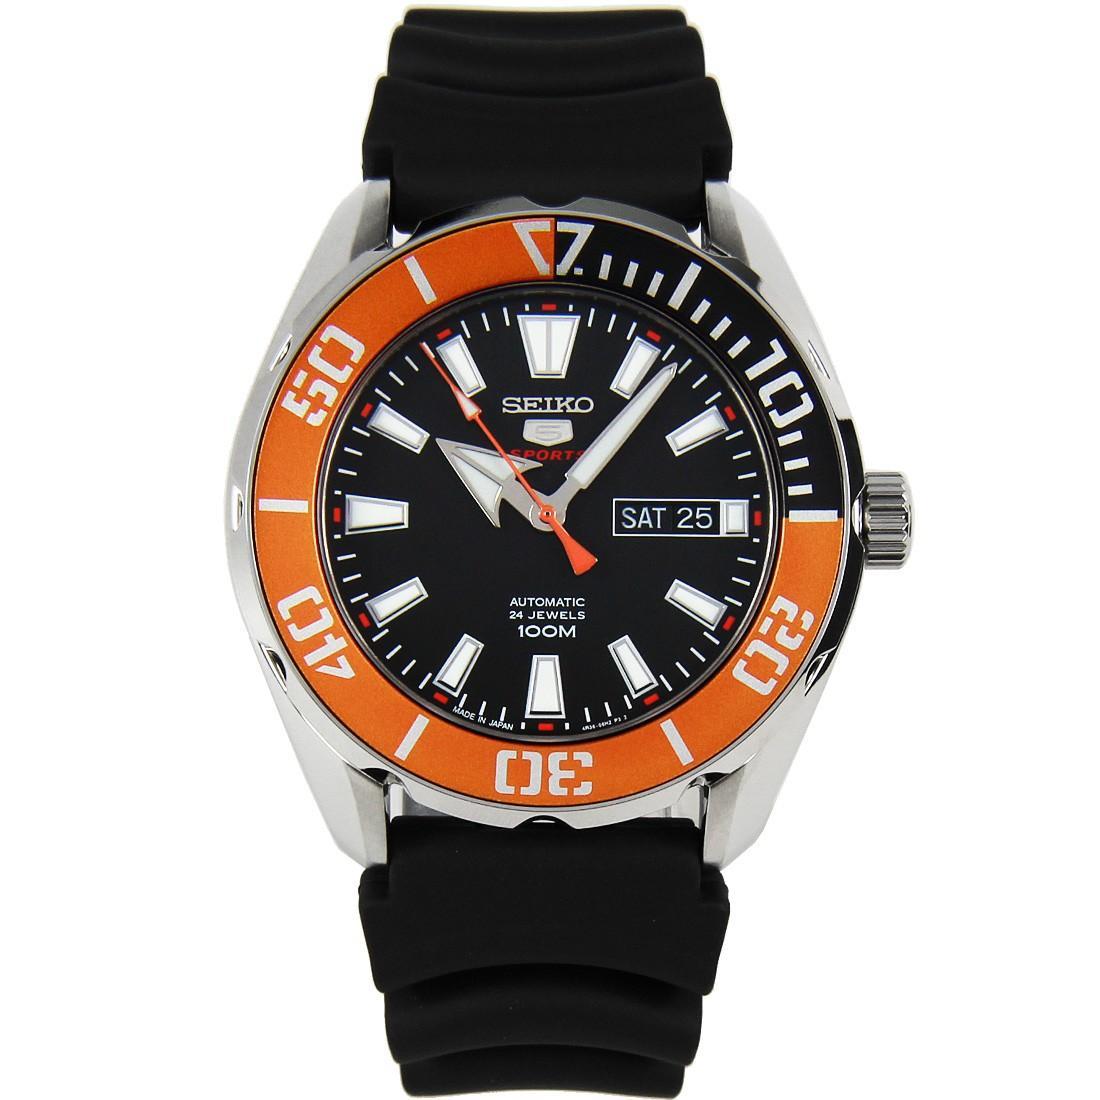 Seiko 5 SRPC59J1 SRPC59J SRPC59 Sports Automatic Orange Bezel Black Rubber 100M Men's Watch